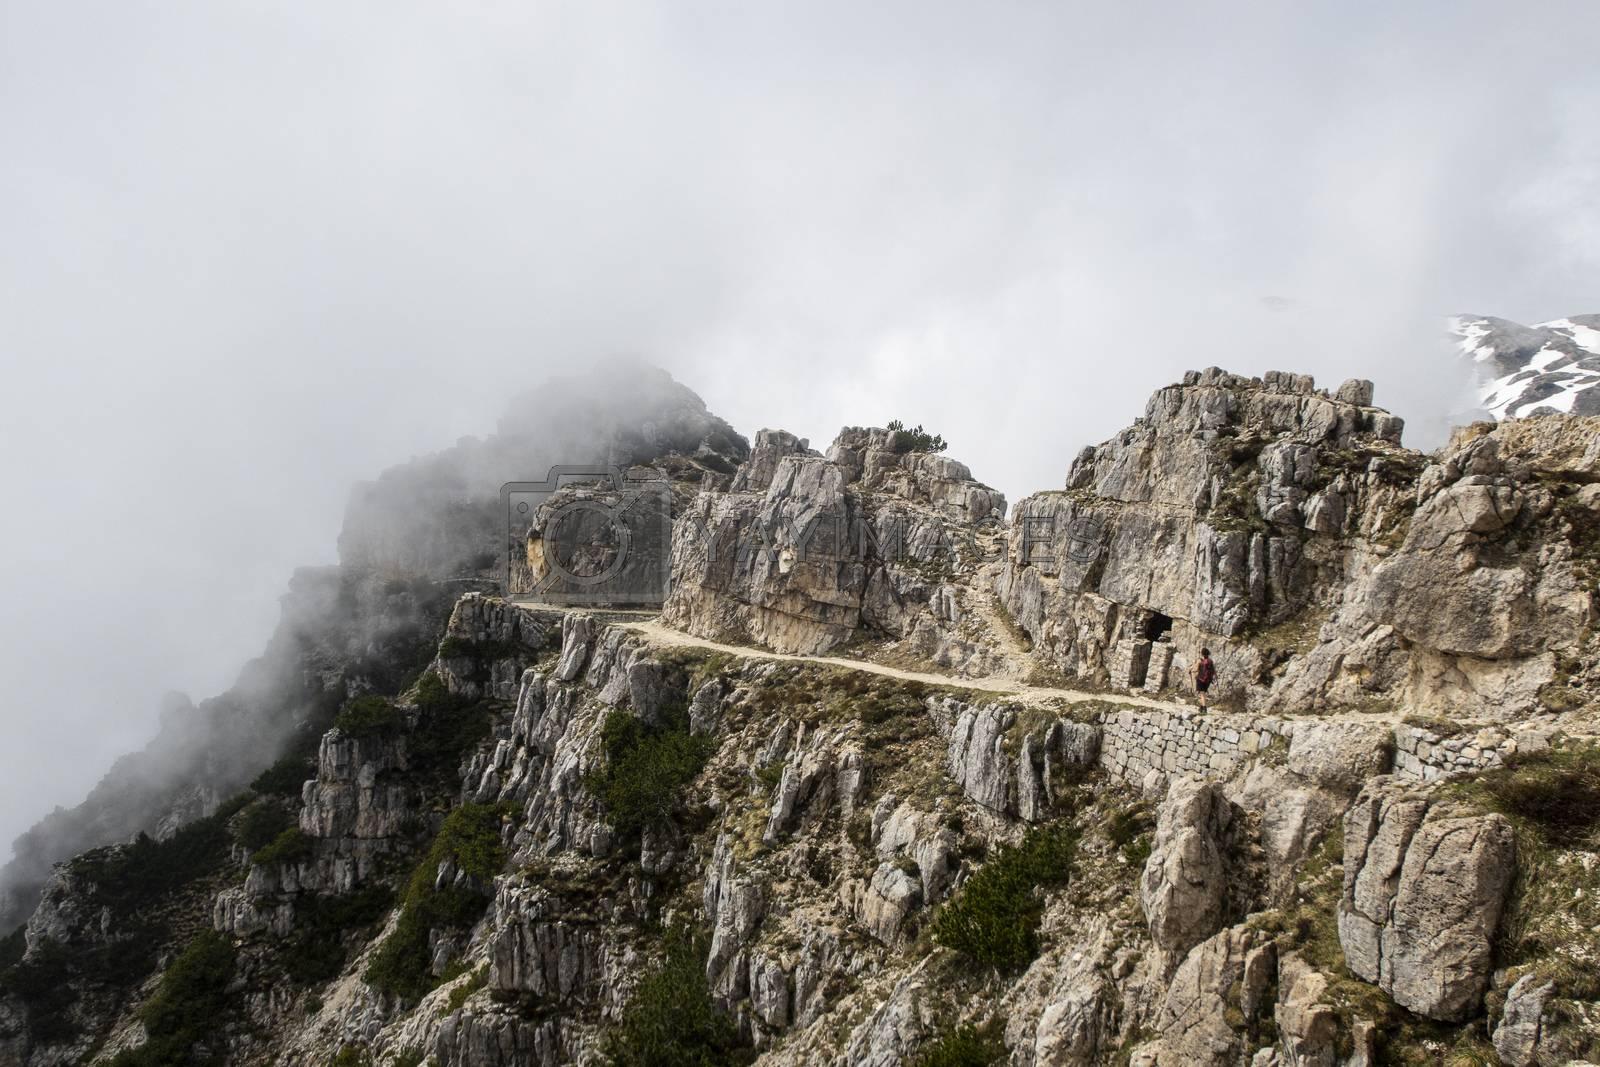 pasubio mountain in the italian alps